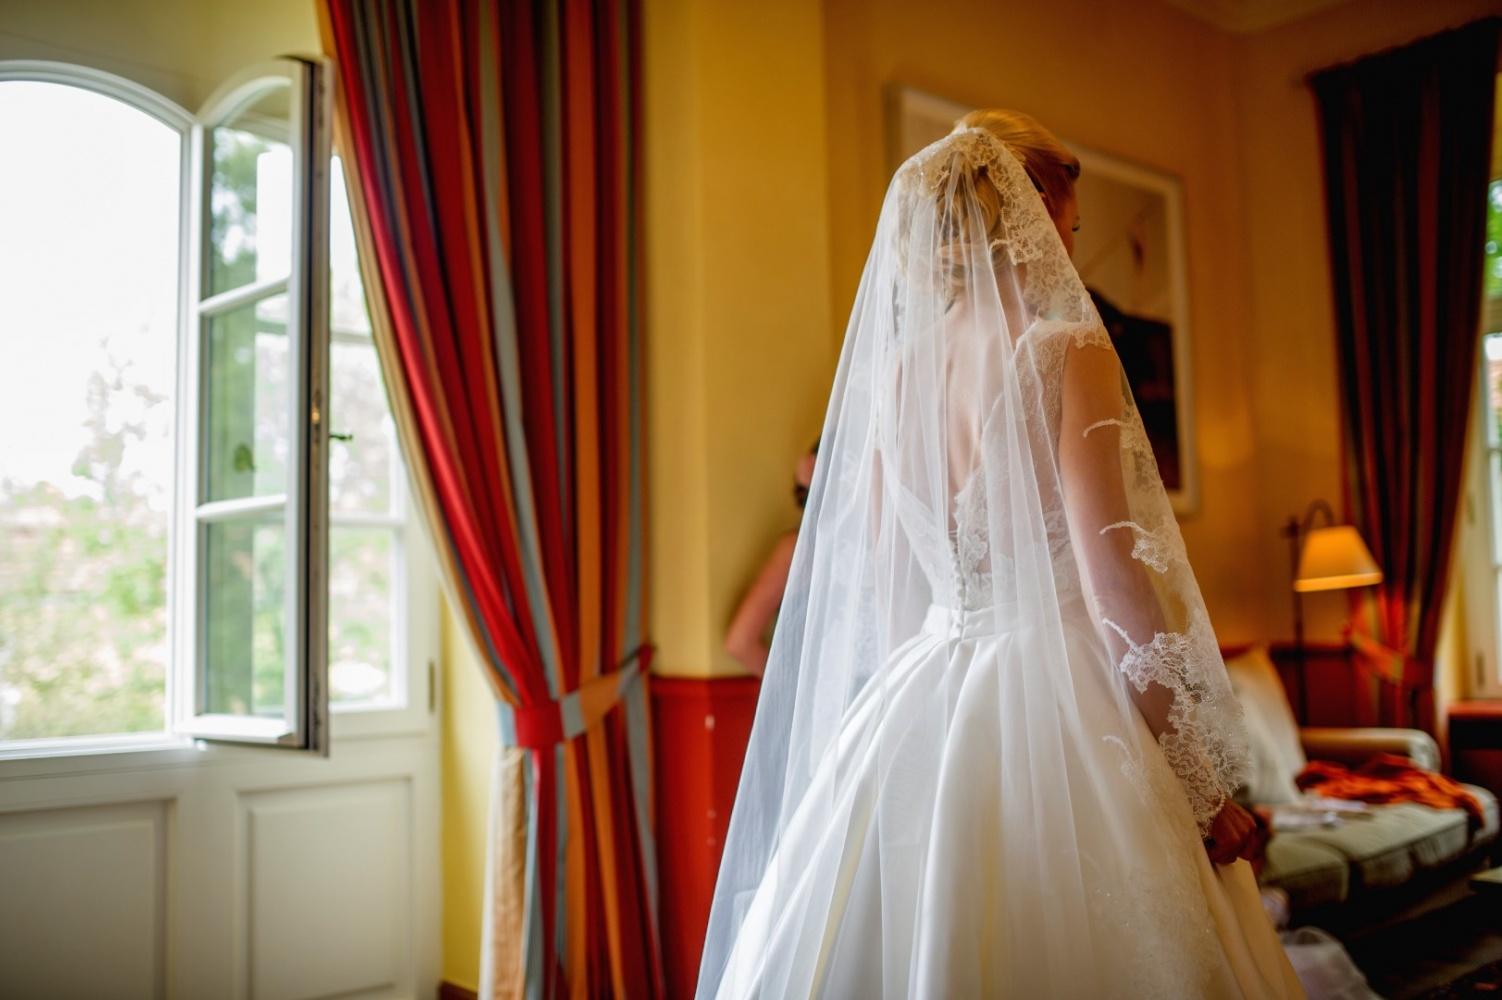 http://www.fotoz.sk/images/gallery-26/normal/svadba_hotel-chateau-bela_036.jpg